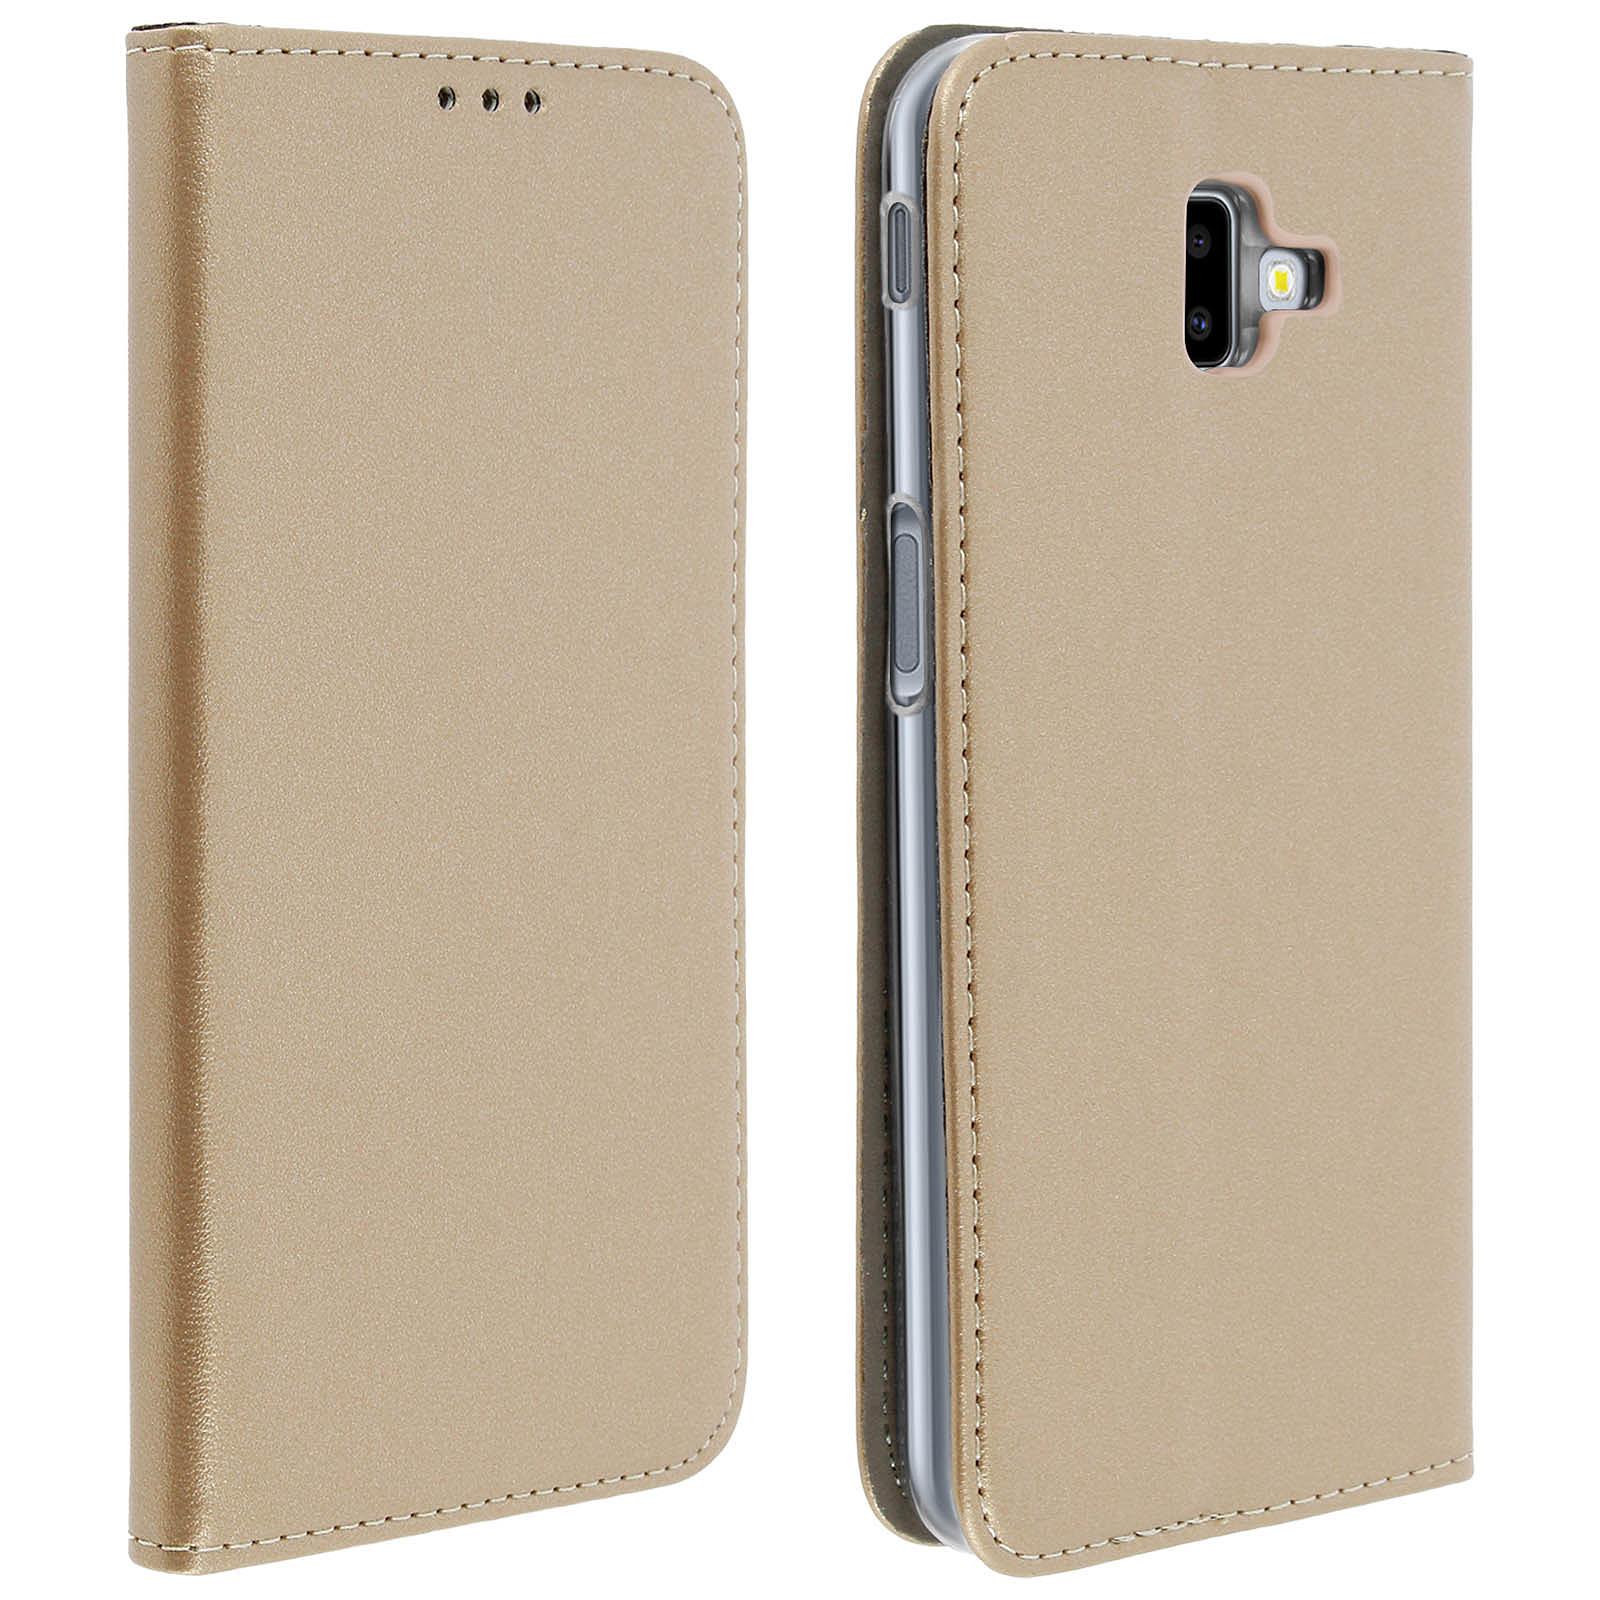 Avizar Etui folio Dorée pour Samsung Galaxy J6 Plus